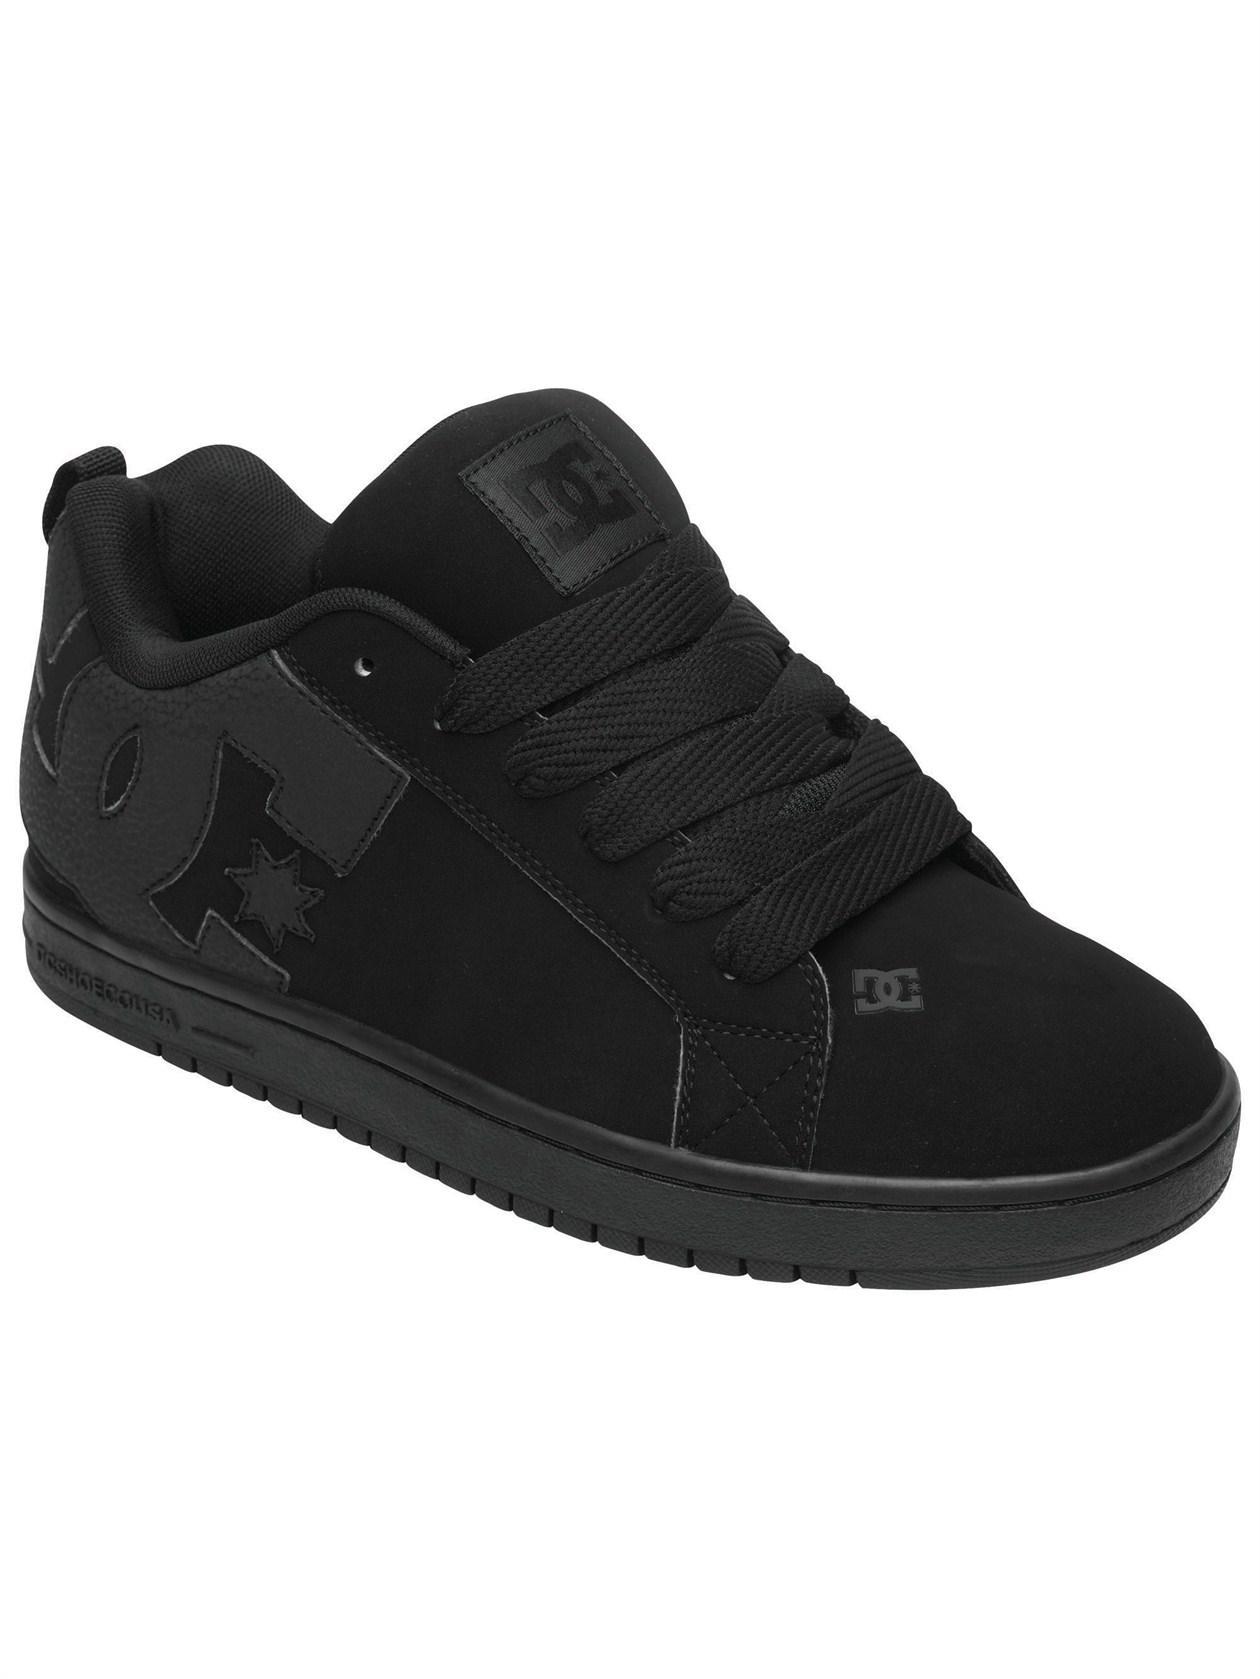 Buty Dc Court Graffik (Black/ Black/ Black) Ss16